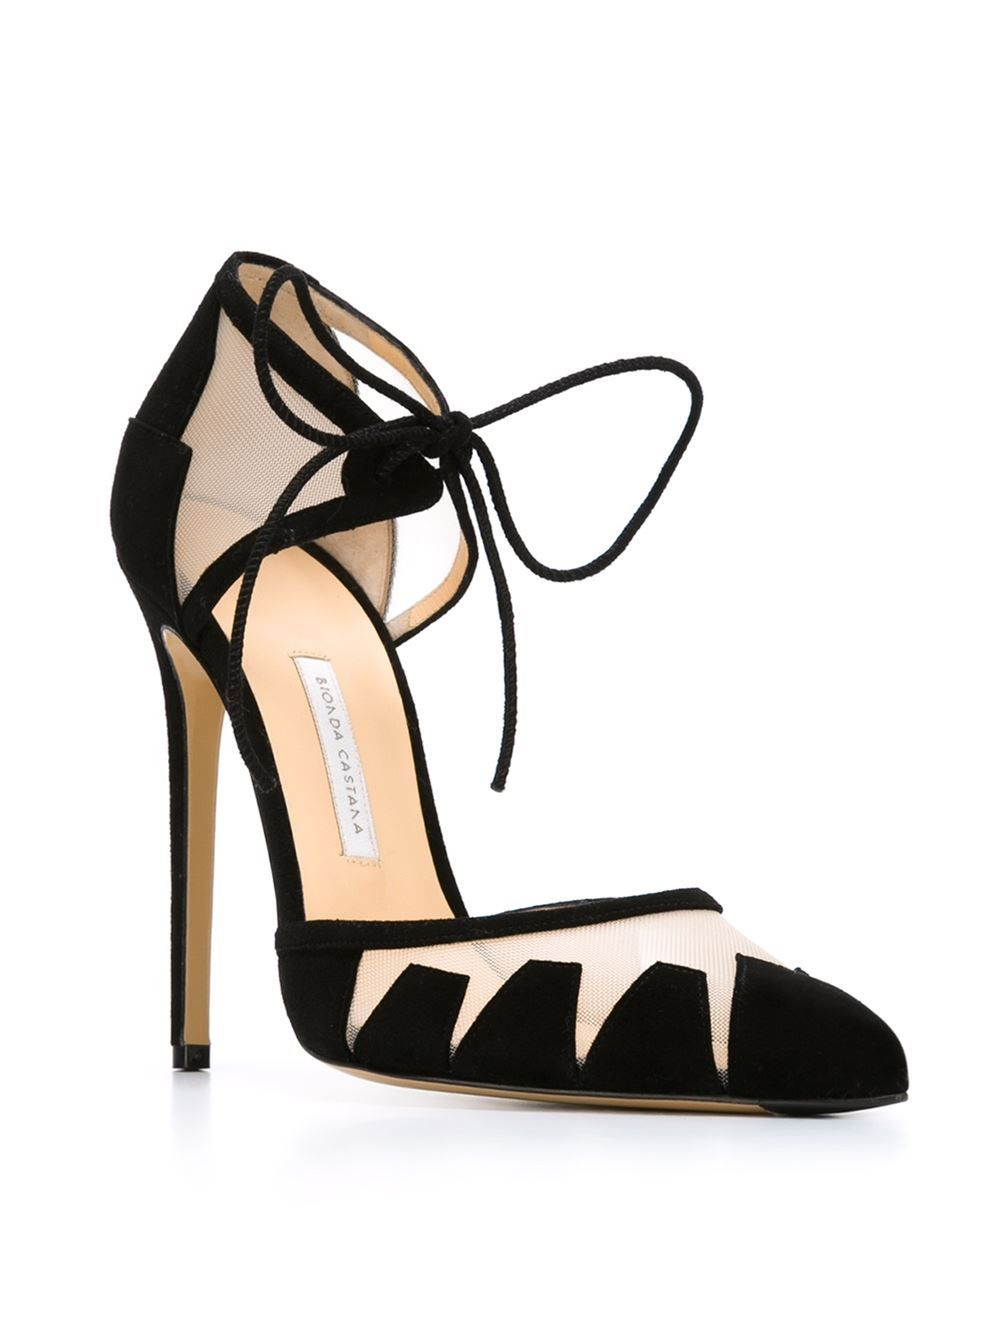 42620935af26b Bionda Castana  Lana  Pumps - Farfetch. Bionda CastanaShoes 2017Suede  PumpsDesigner ShoesPumpingWoman ShoesBallet FlatBallerinaSandal